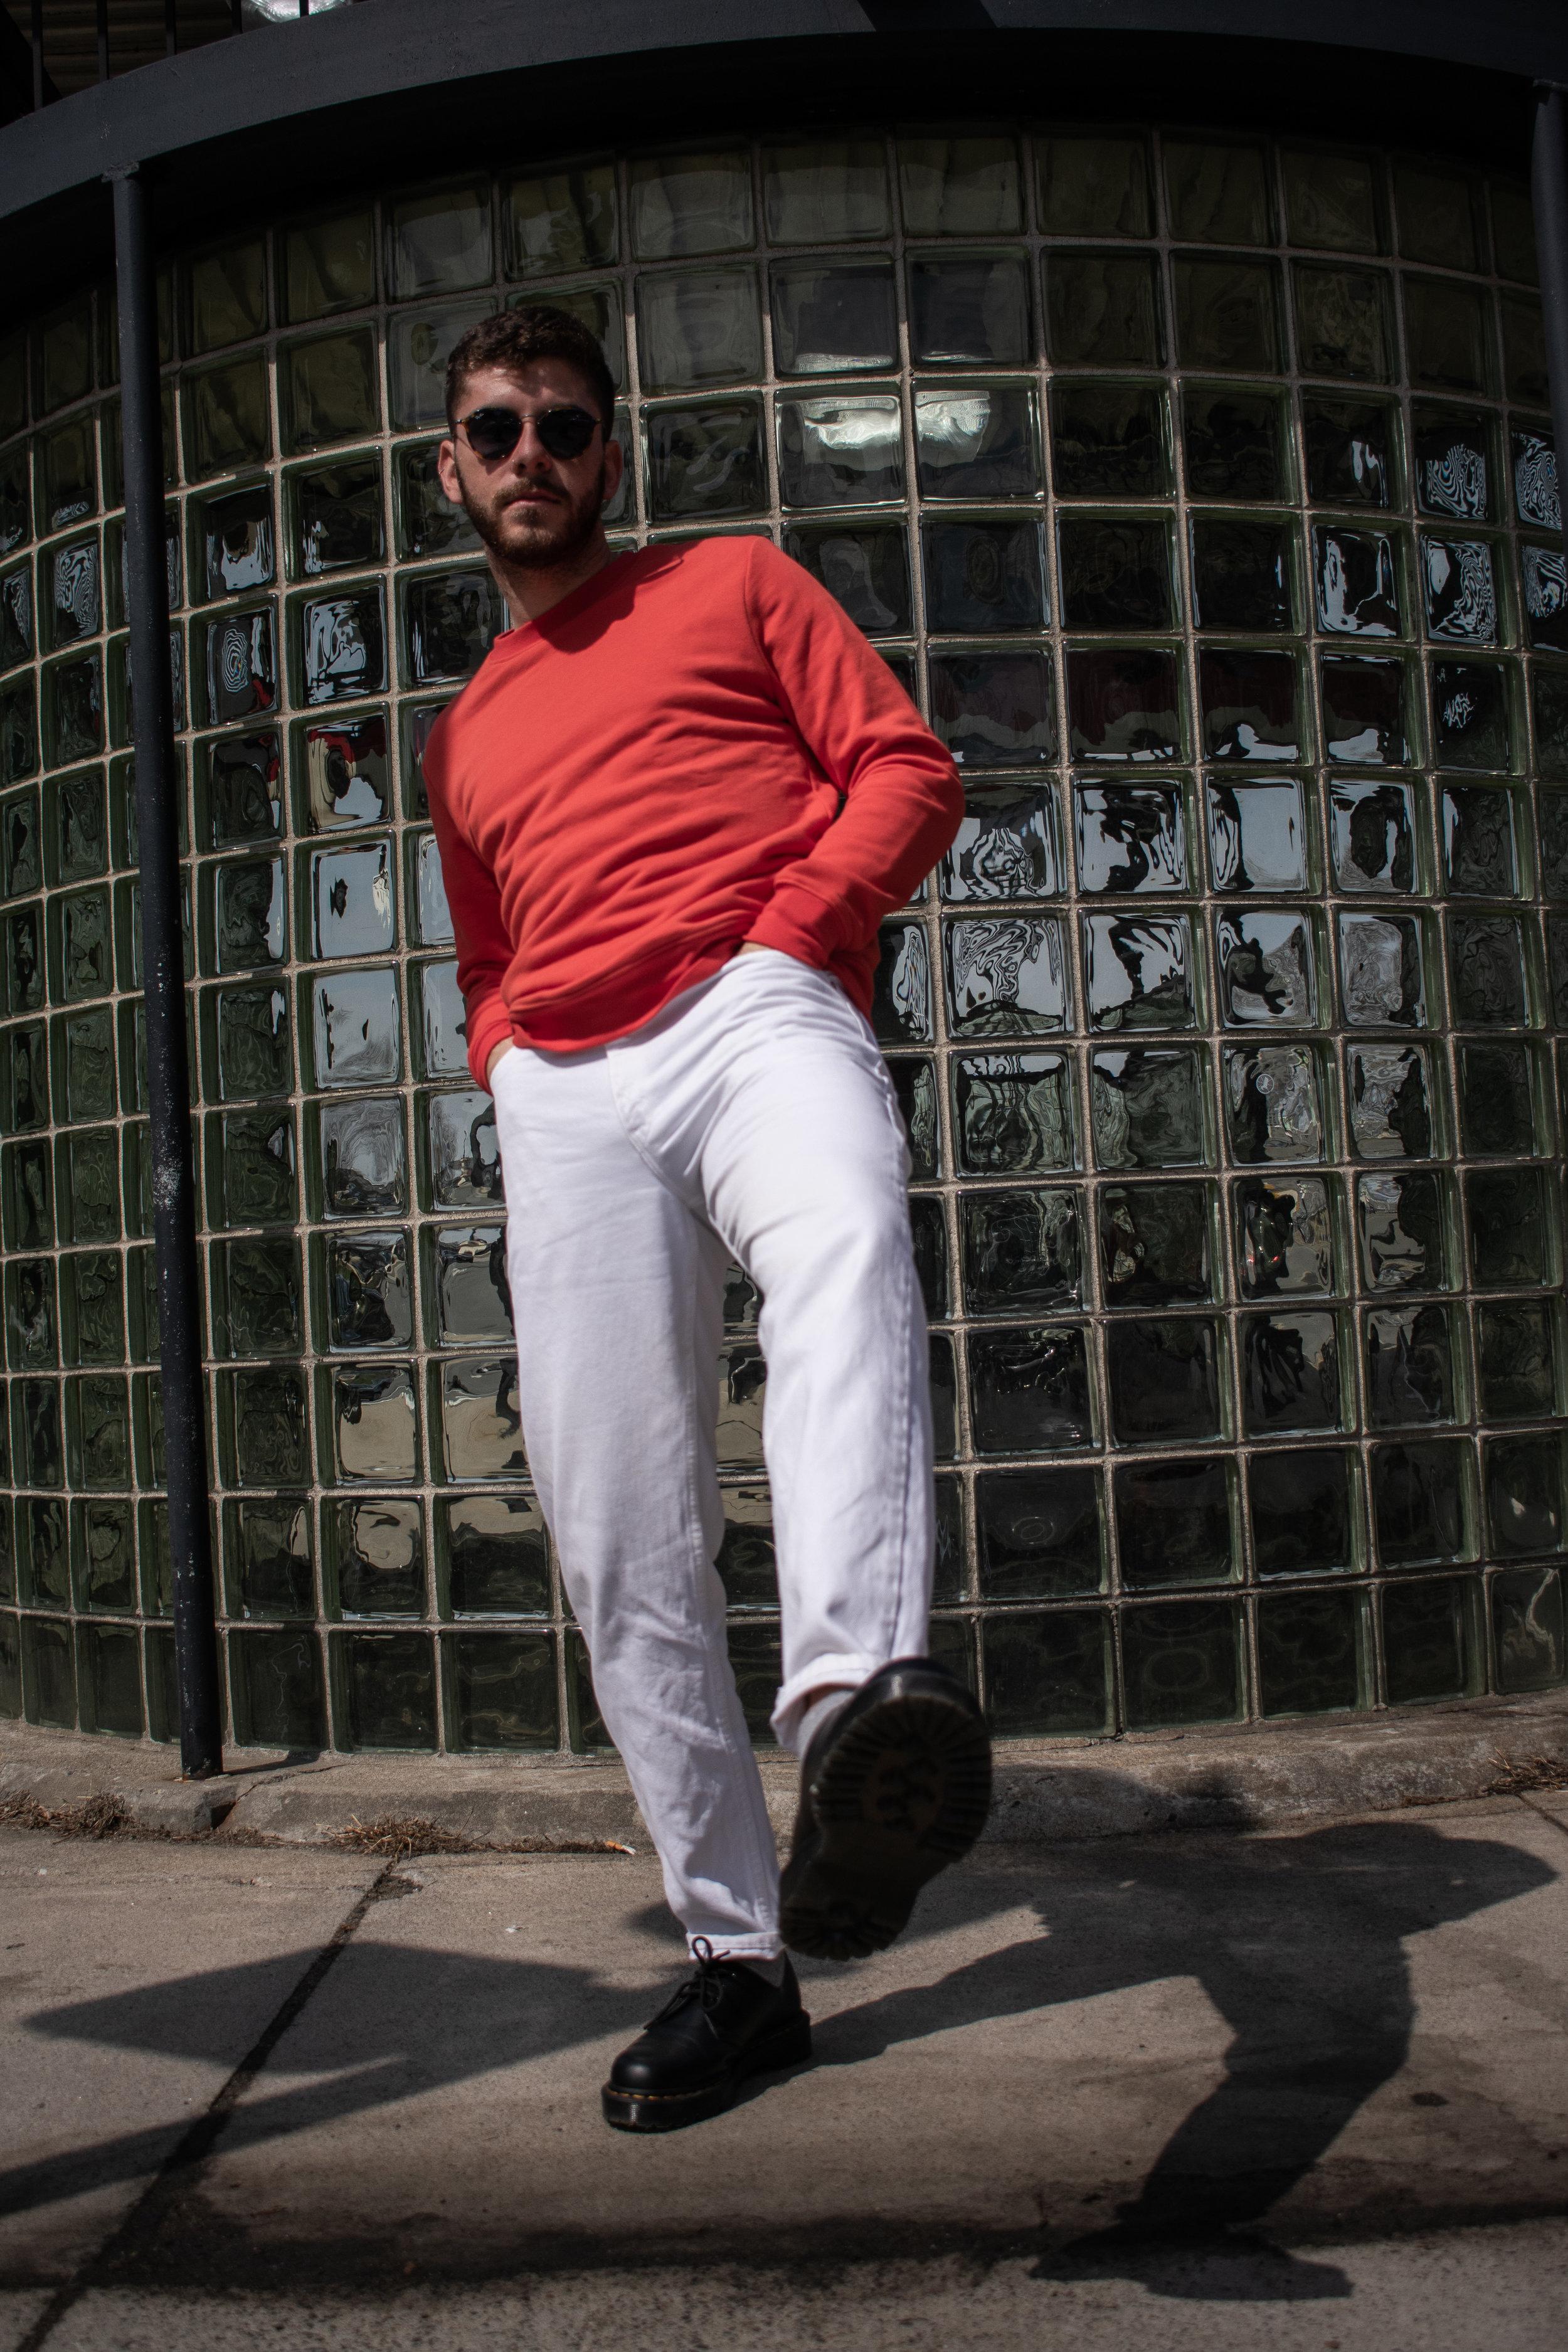 white denim. orange sweatshirt.